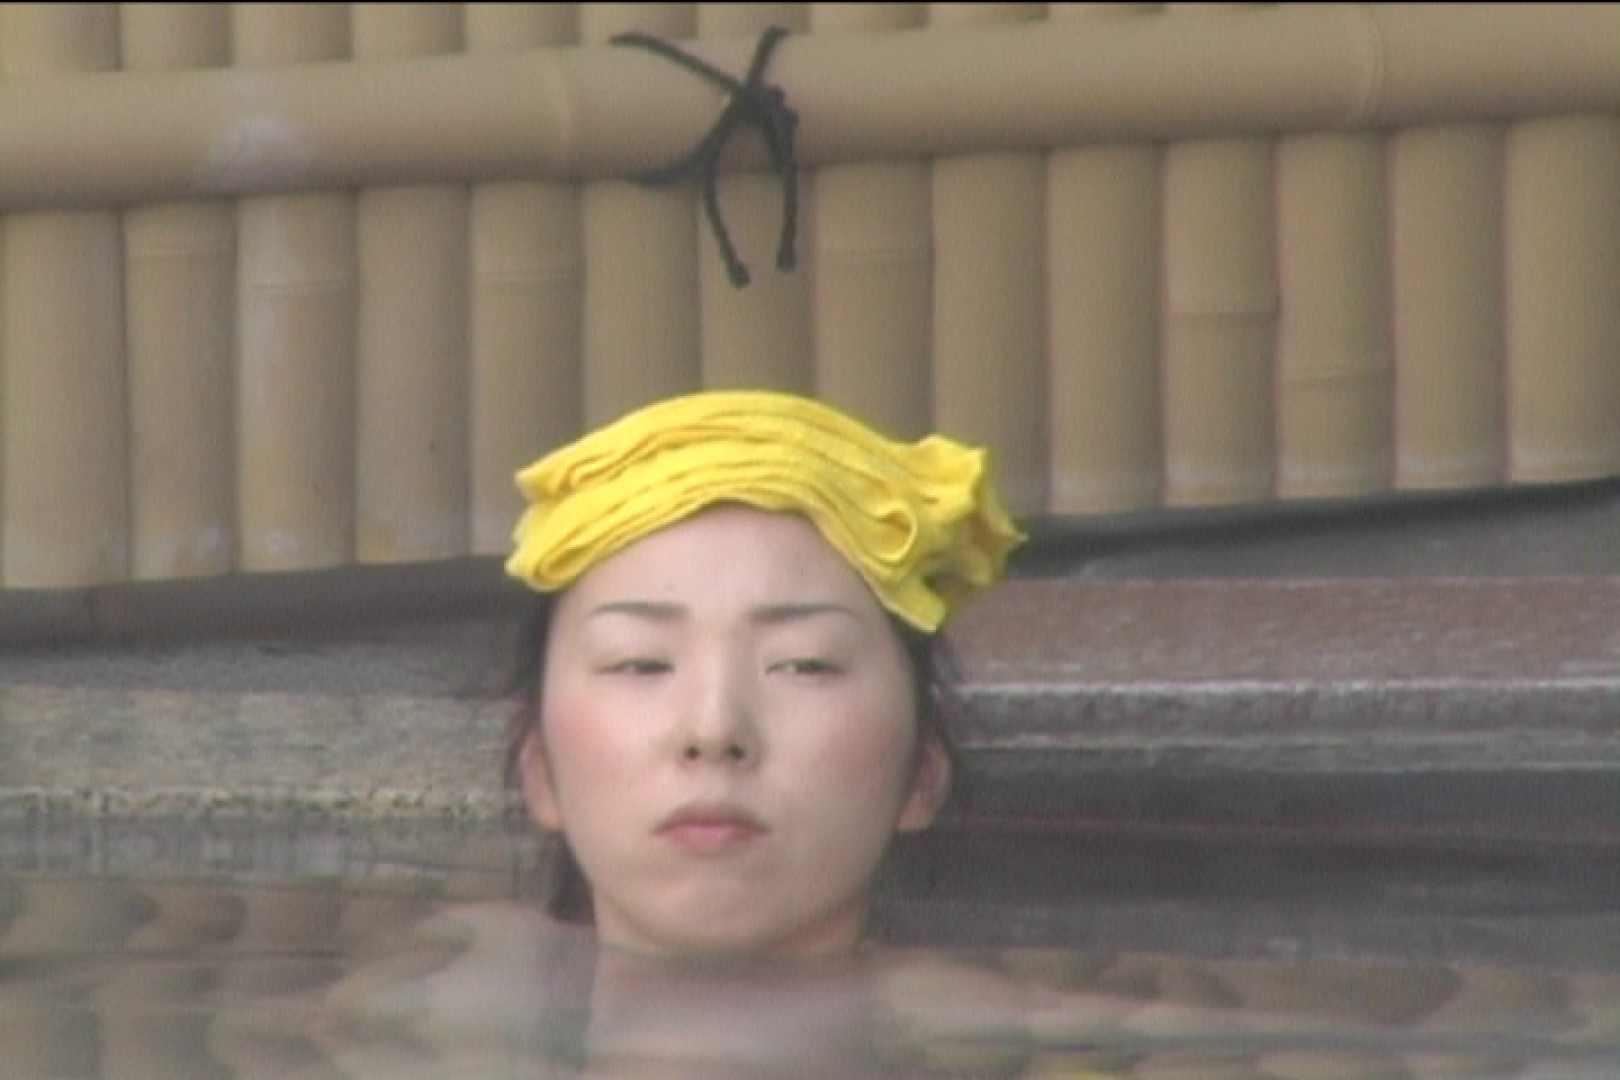 Aquaな露天風呂Vol.529 盗撮シリーズ | 露天風呂編  106PIX 9